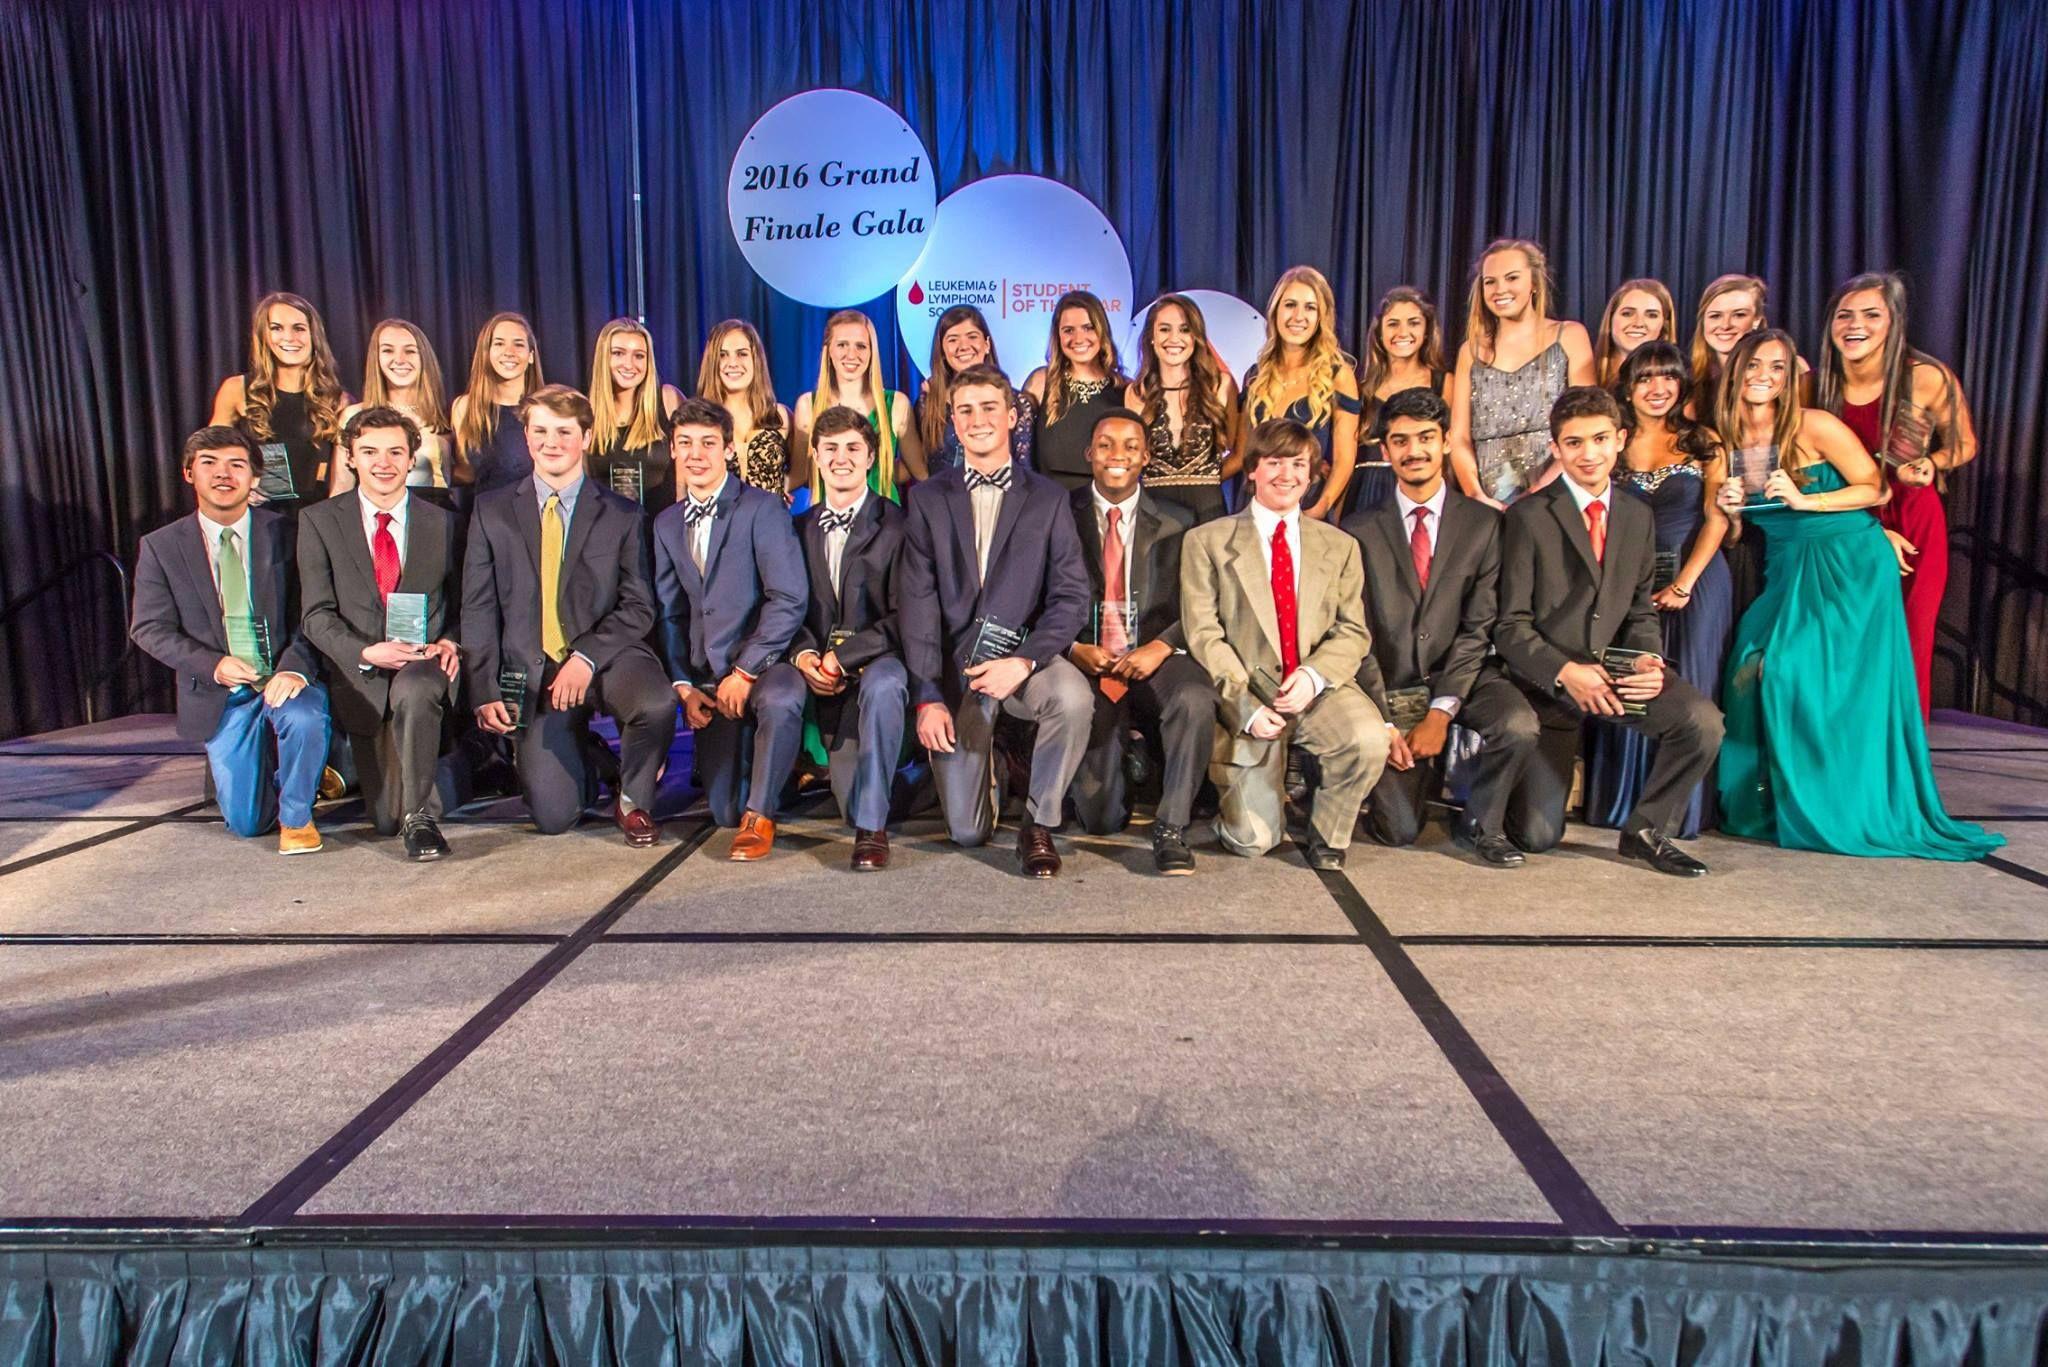 Leukemia & Lymphoma Society – Student of the Year Campaign